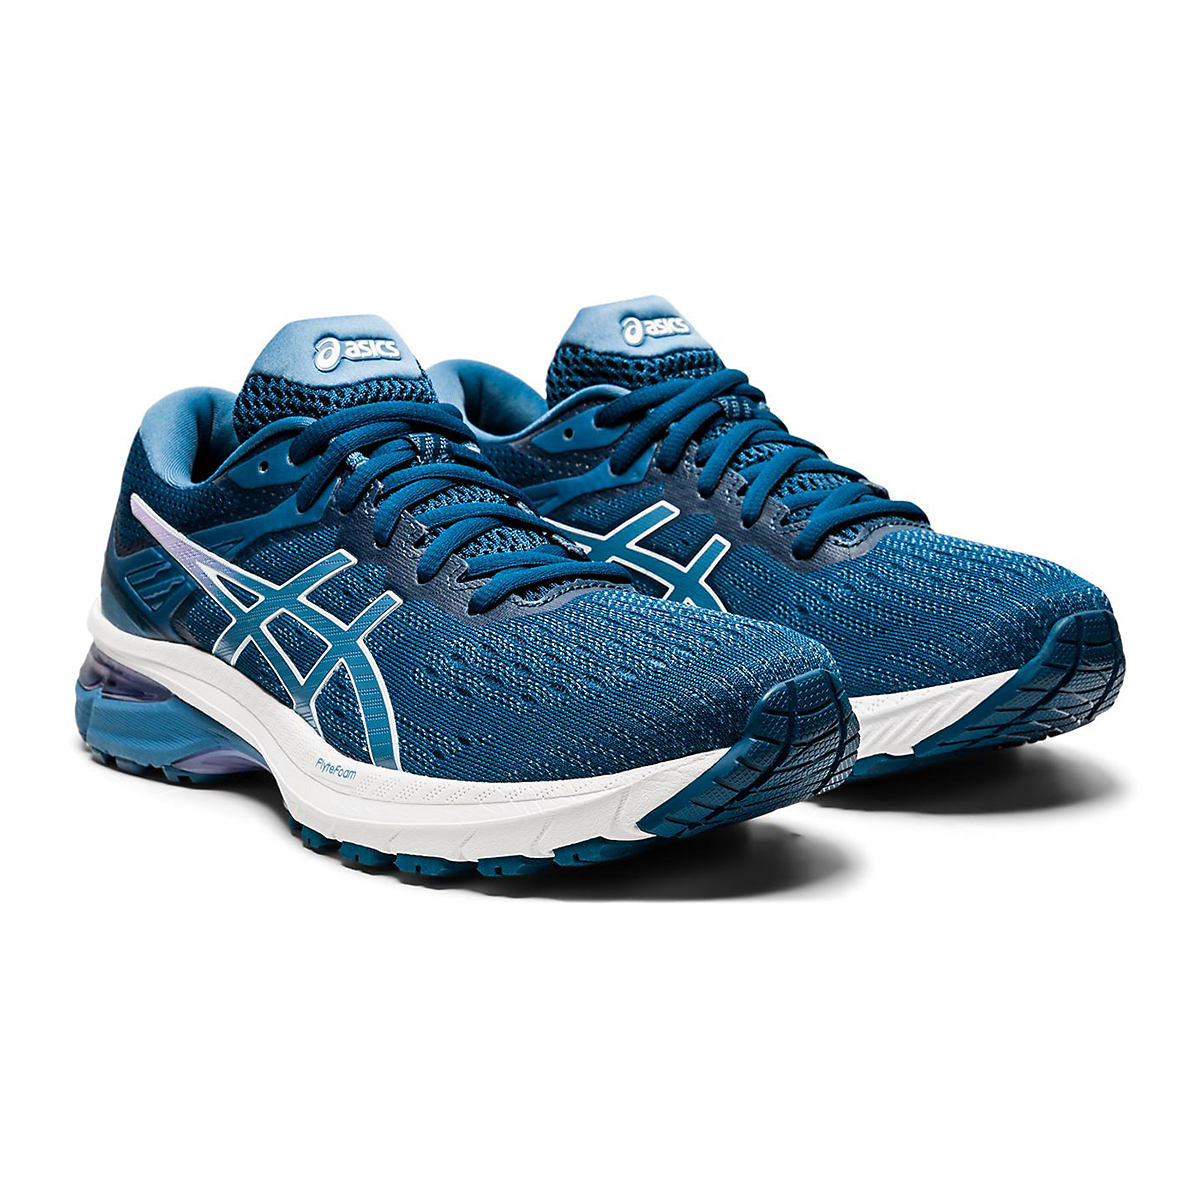 Women's Asics Gt-2000 9 Running Shoe - Color: Mako Blue/Grey - Size: 6 - Width: Wide, Mako Blue/Grey, large, image 4